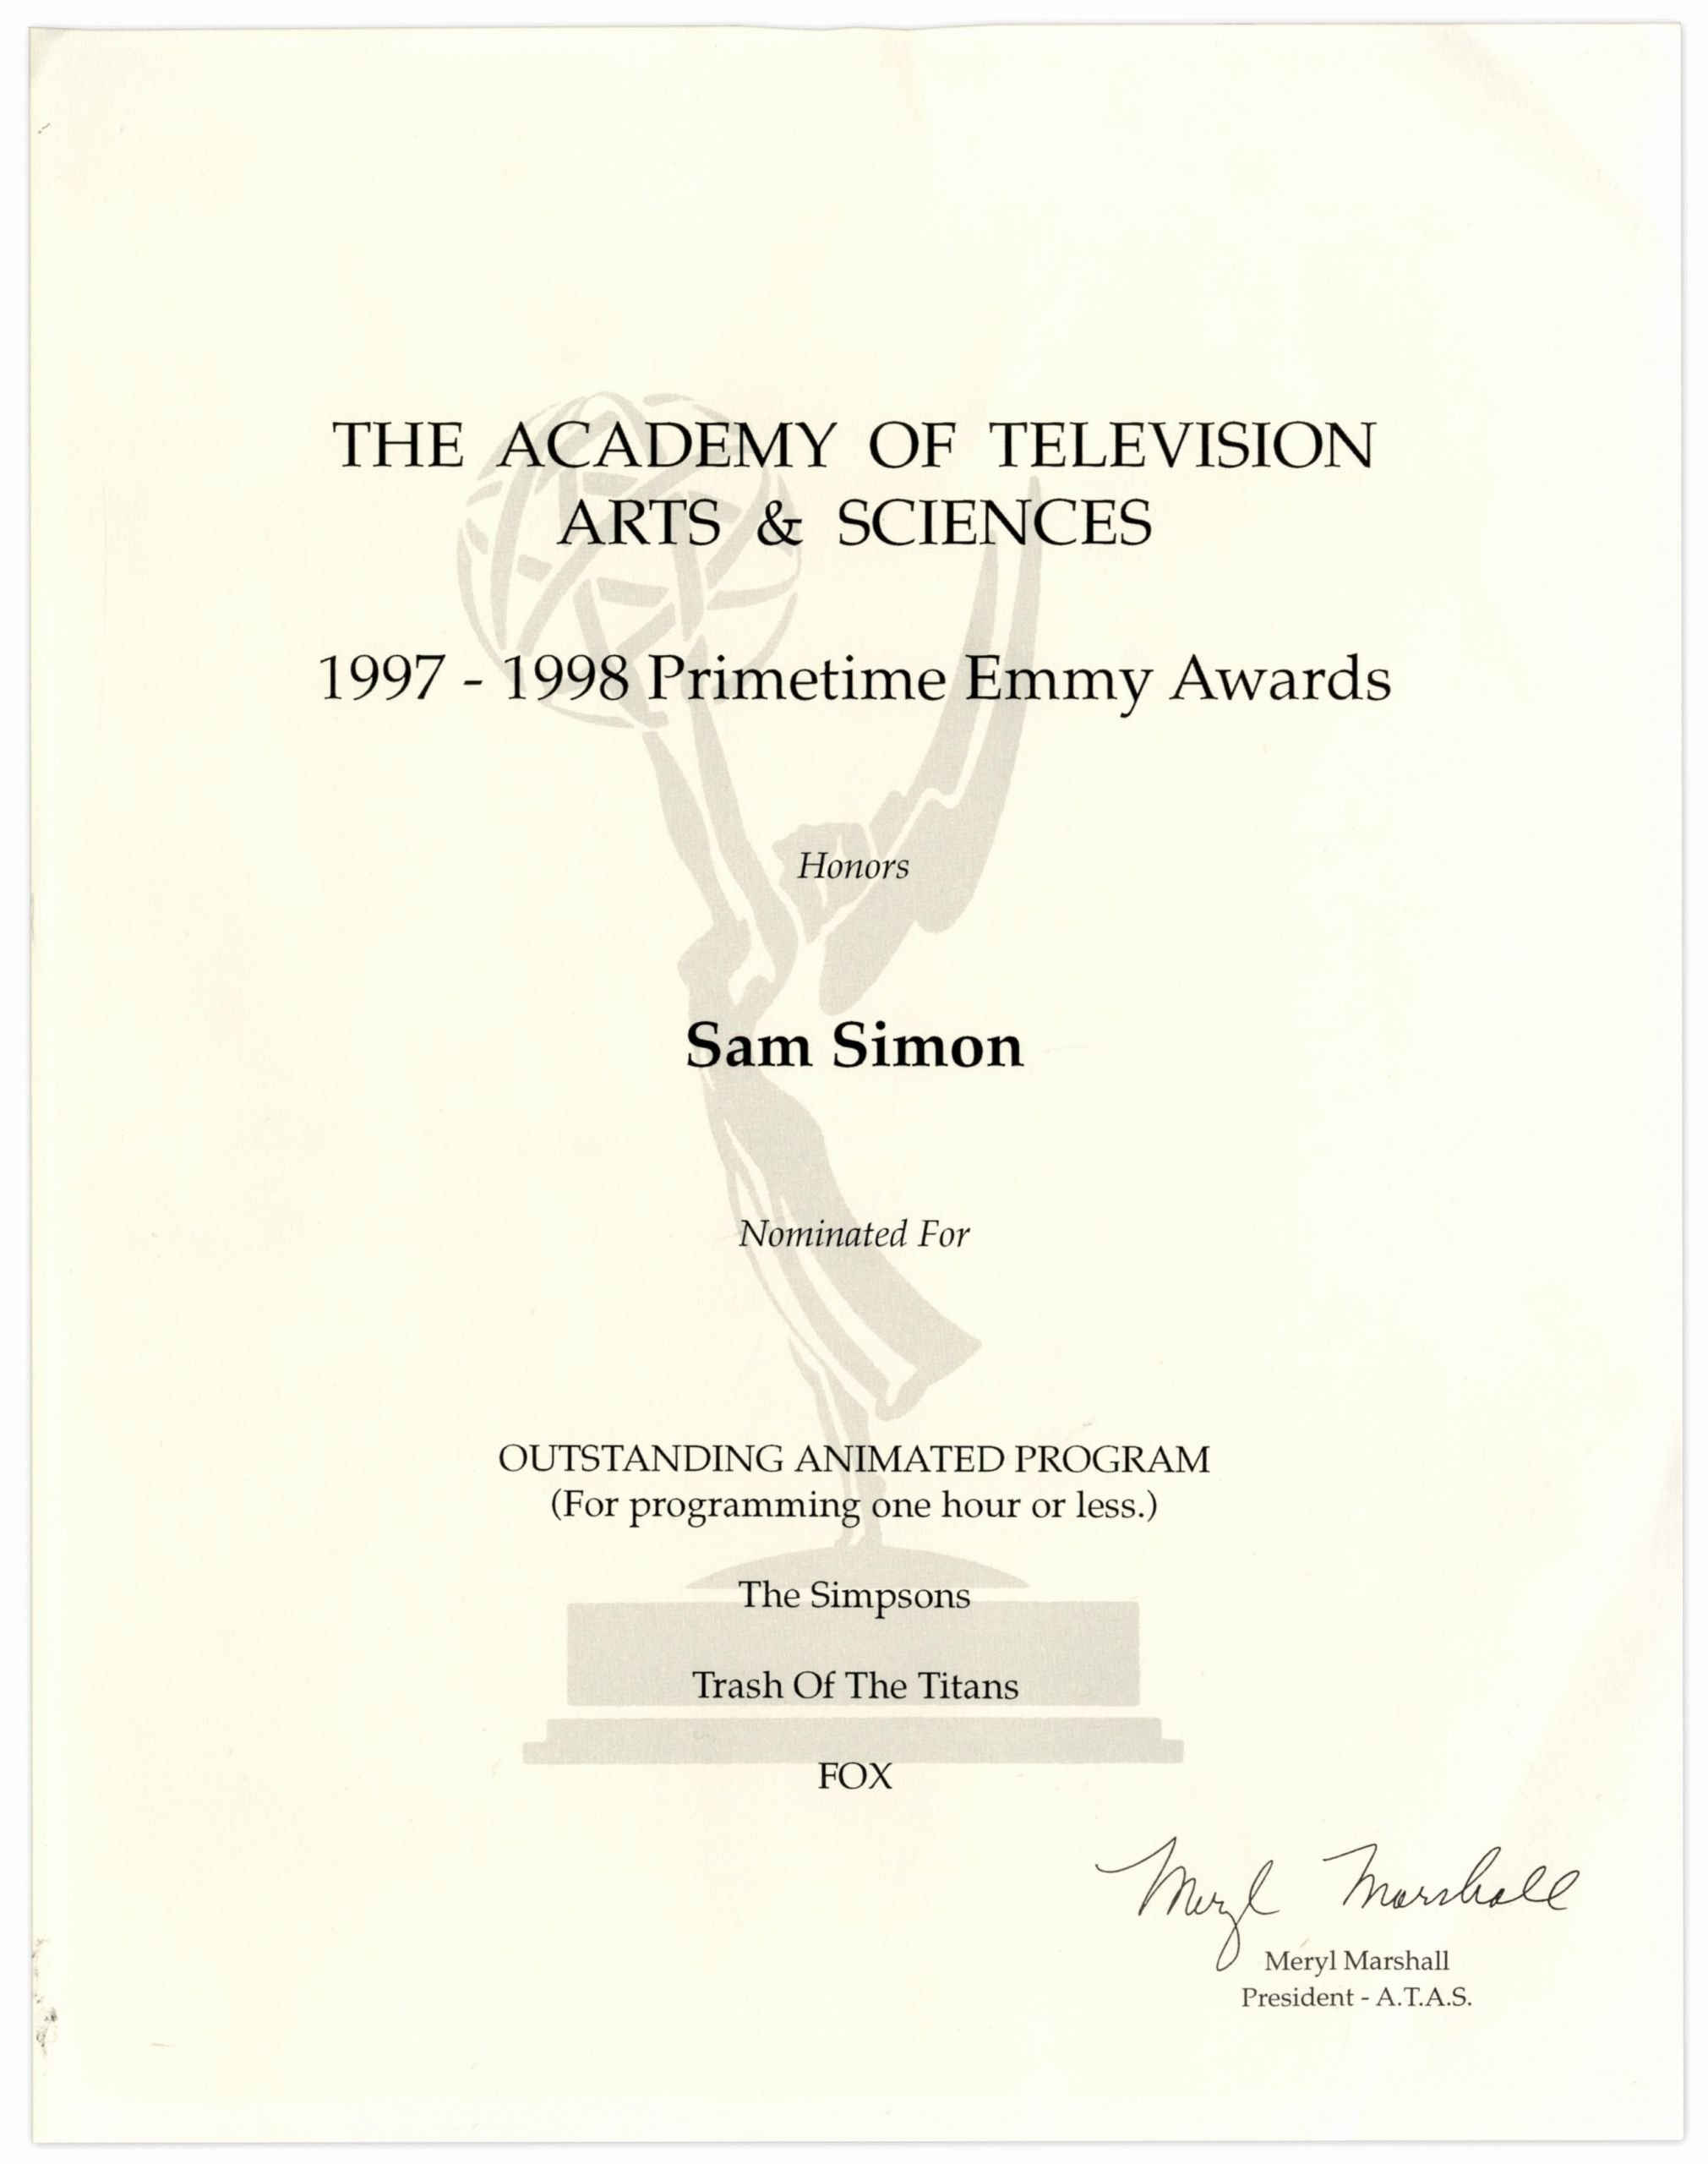 Good Samaritan Award Certificates Unique Lot Detail Emmy Nomination Certificate for the